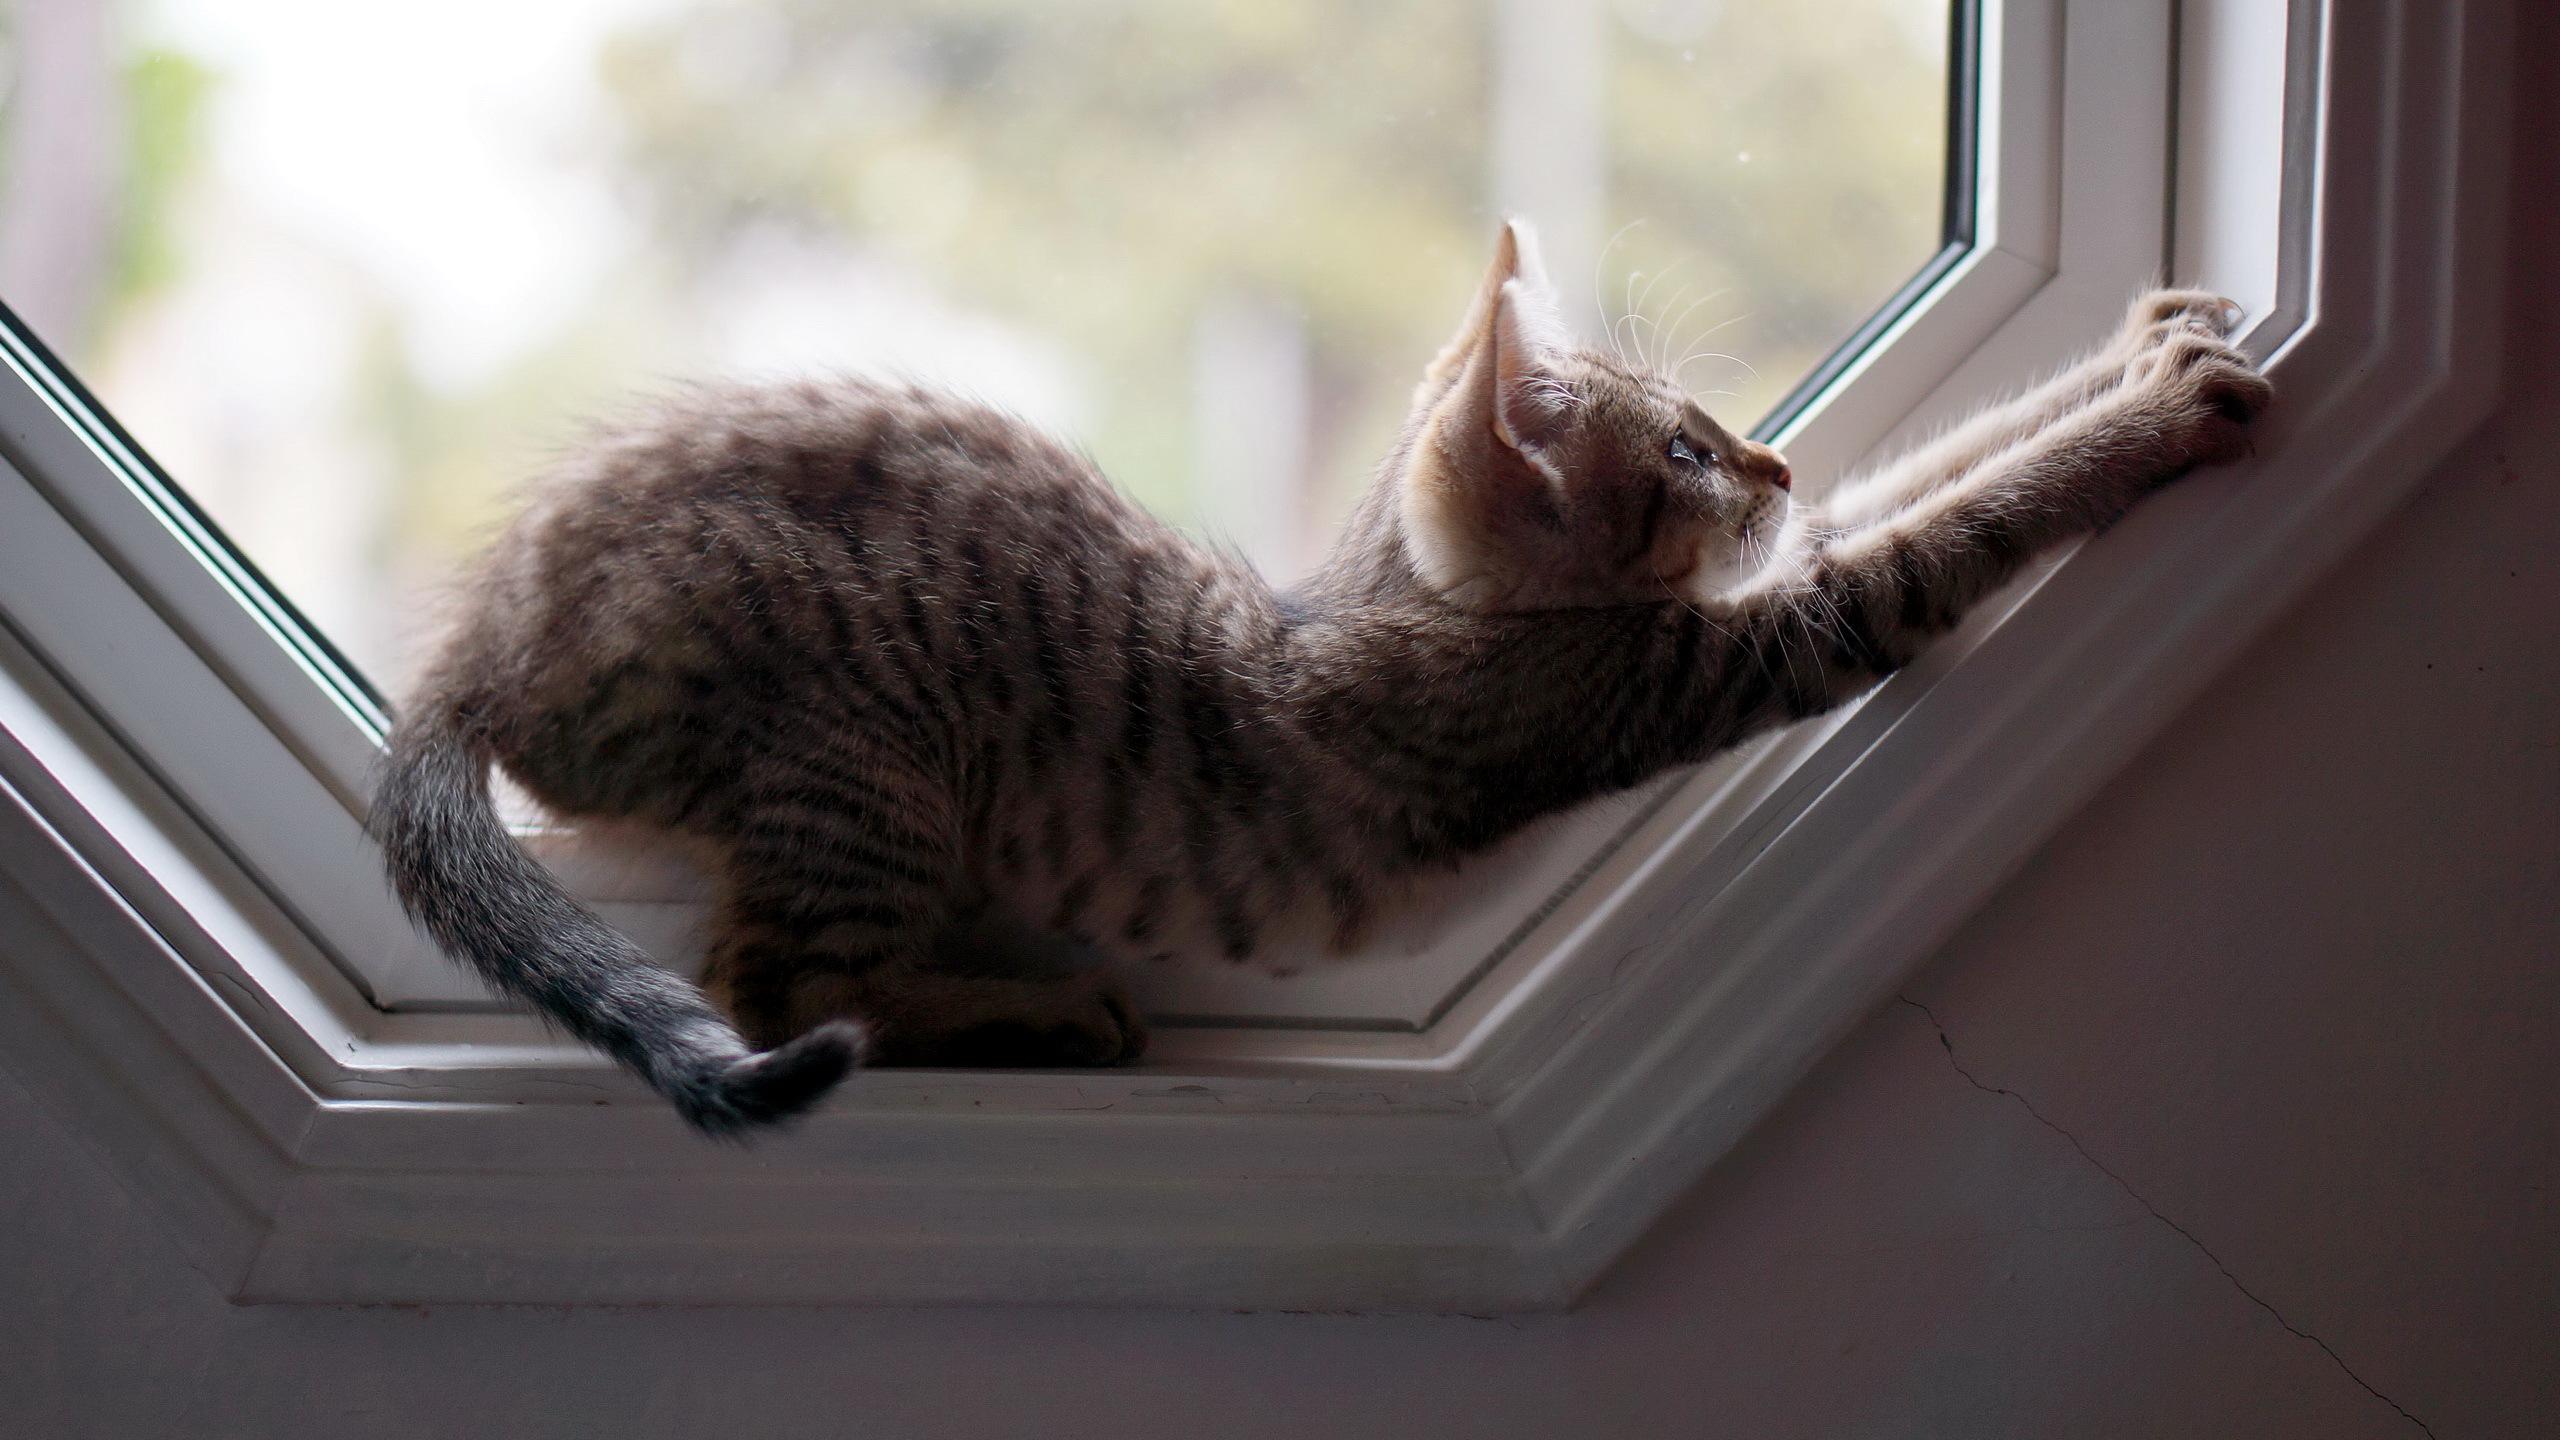 котята на окне kittens on the window  № 3063282 бесплатно